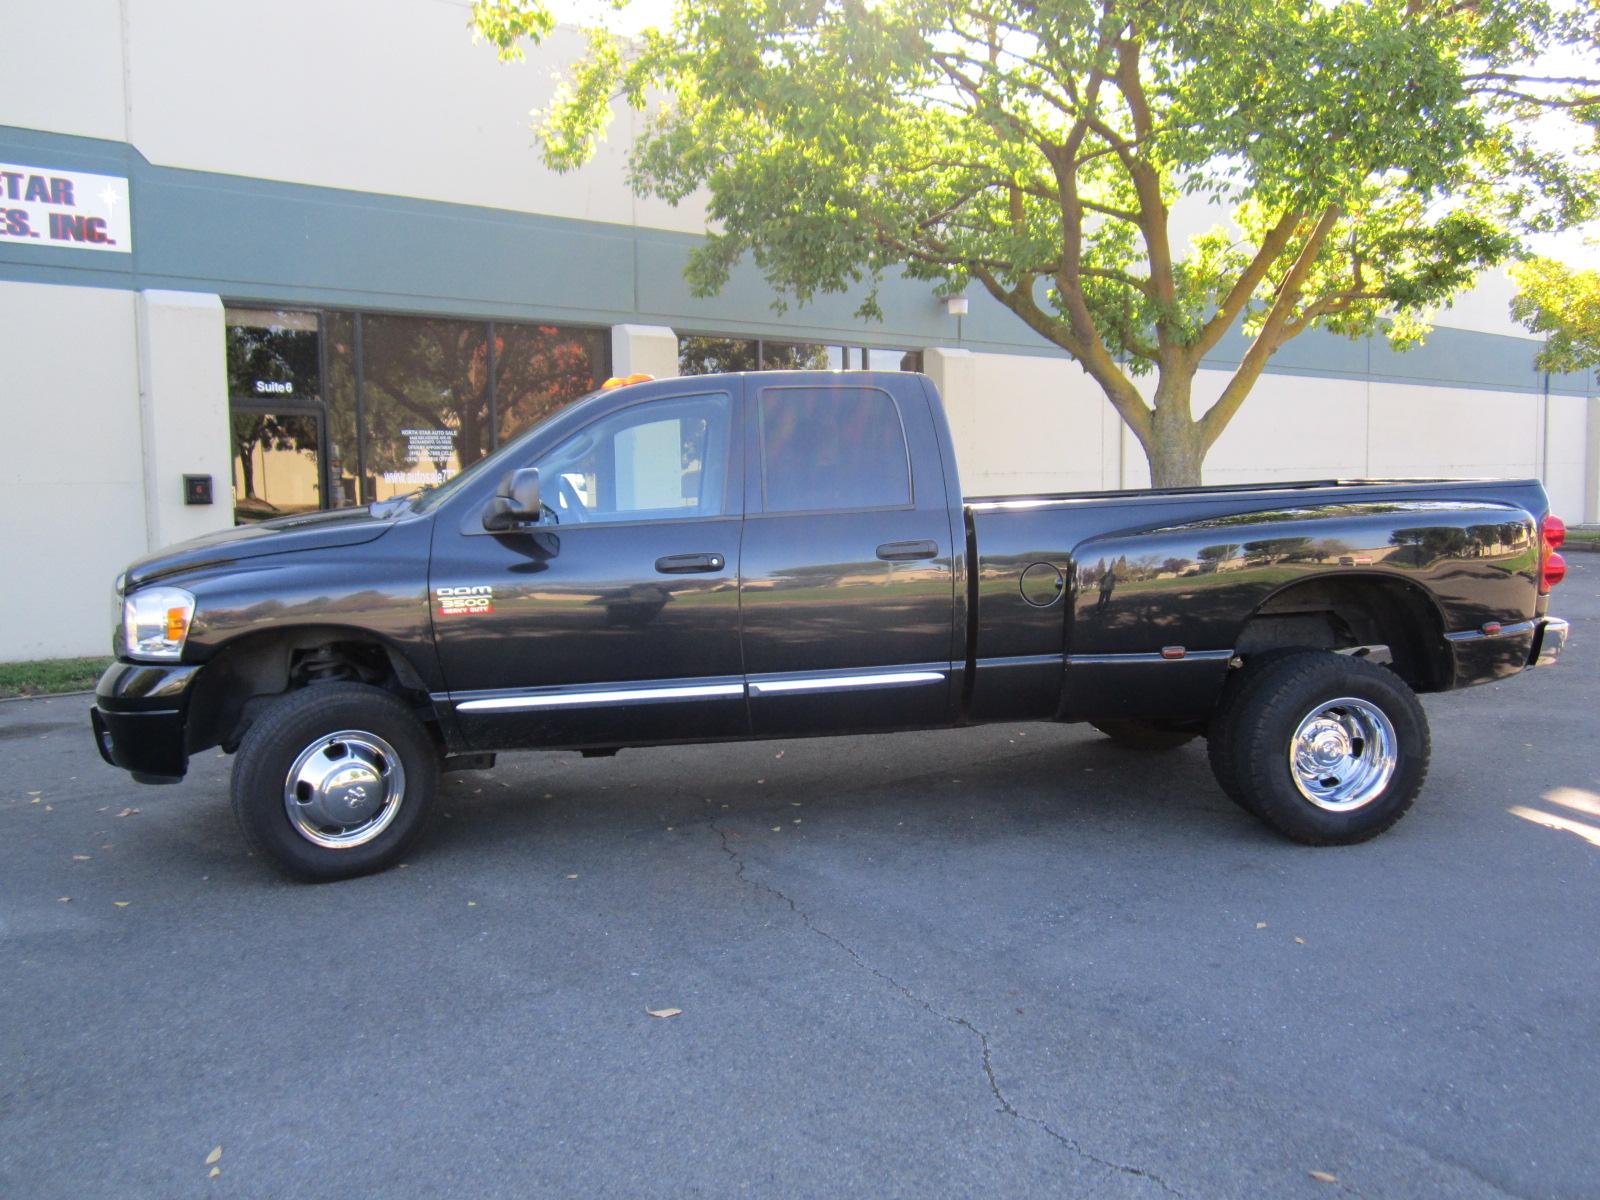 used dodge diesel 4x4 trucks sale california. Black Bedroom Furniture Sets. Home Design Ideas